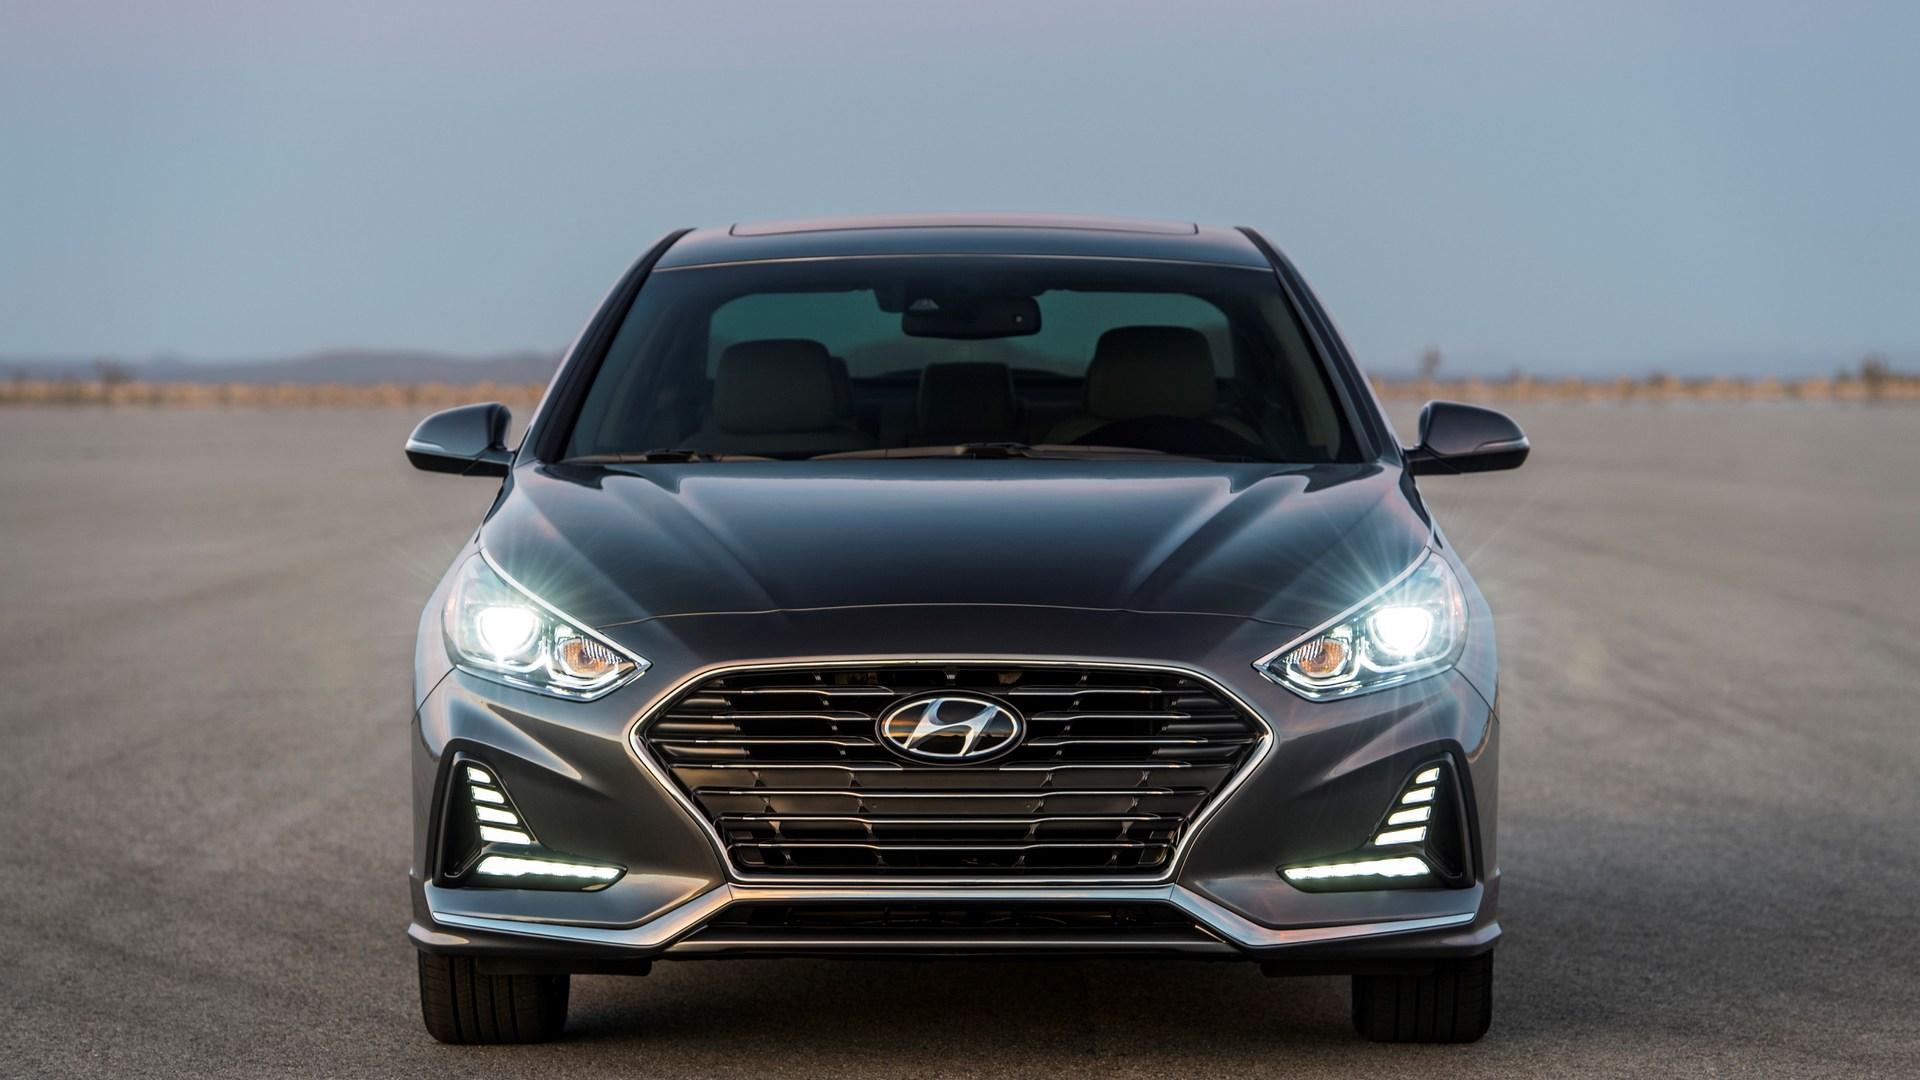 space sonata hyundai original depth driver reviews s car model and interior in review photo passenger